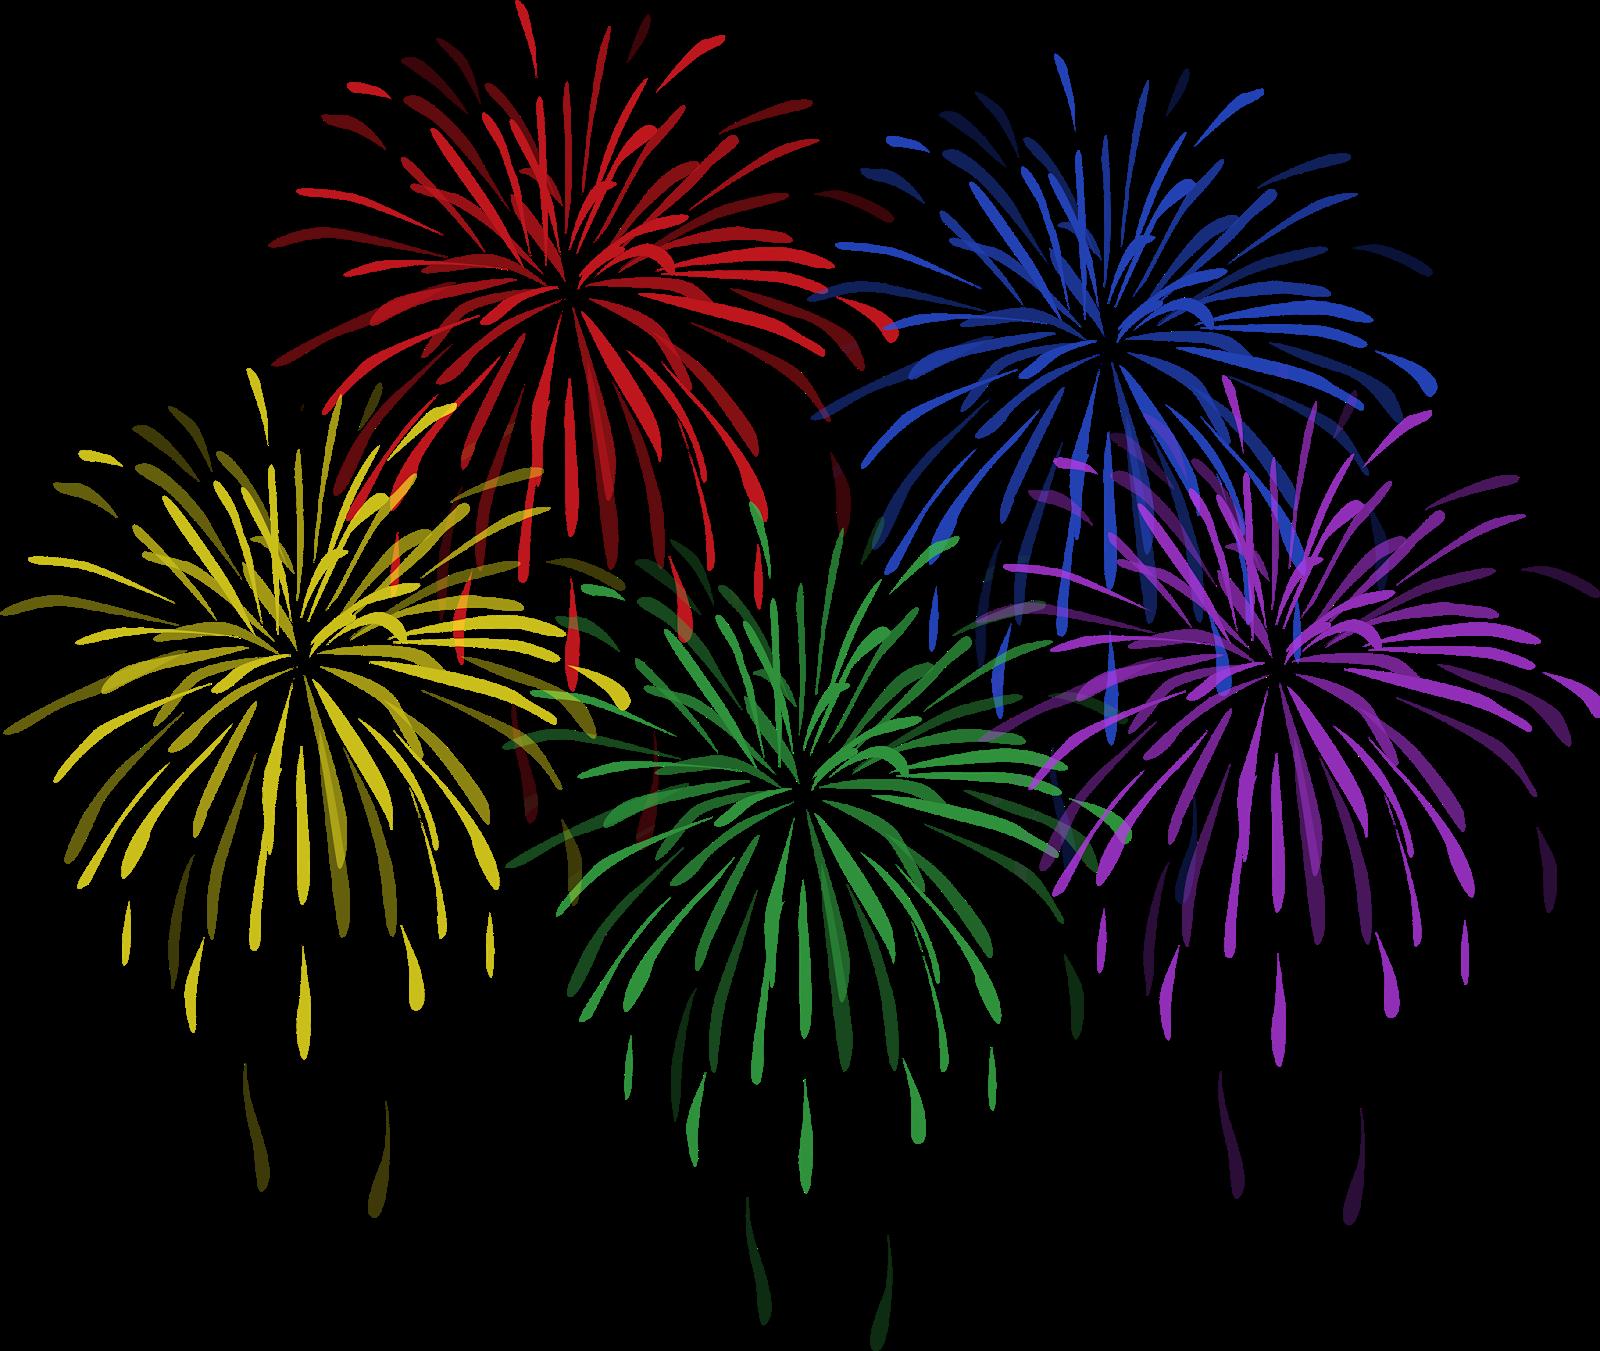 Firework clip art download. Free fireworks images clipart